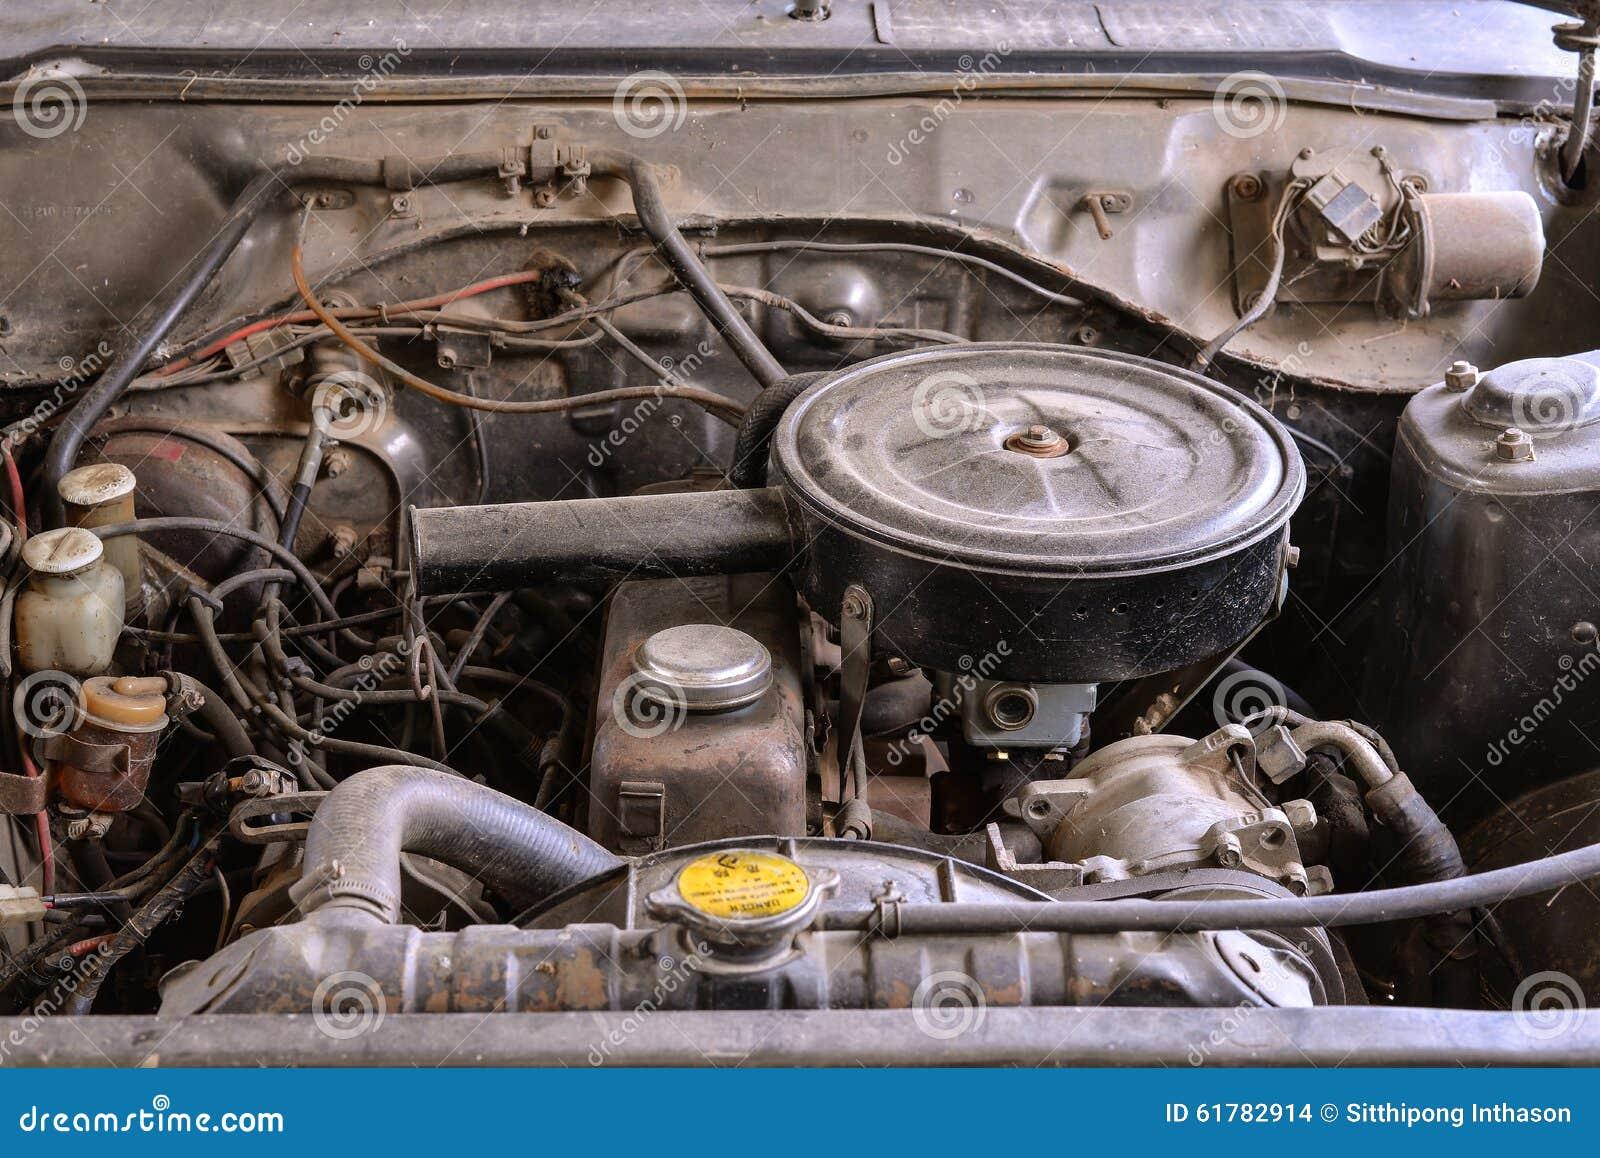 Nett Auto Motor Komponenten Ideen - Elektrische Schaltplan-Ideen ...